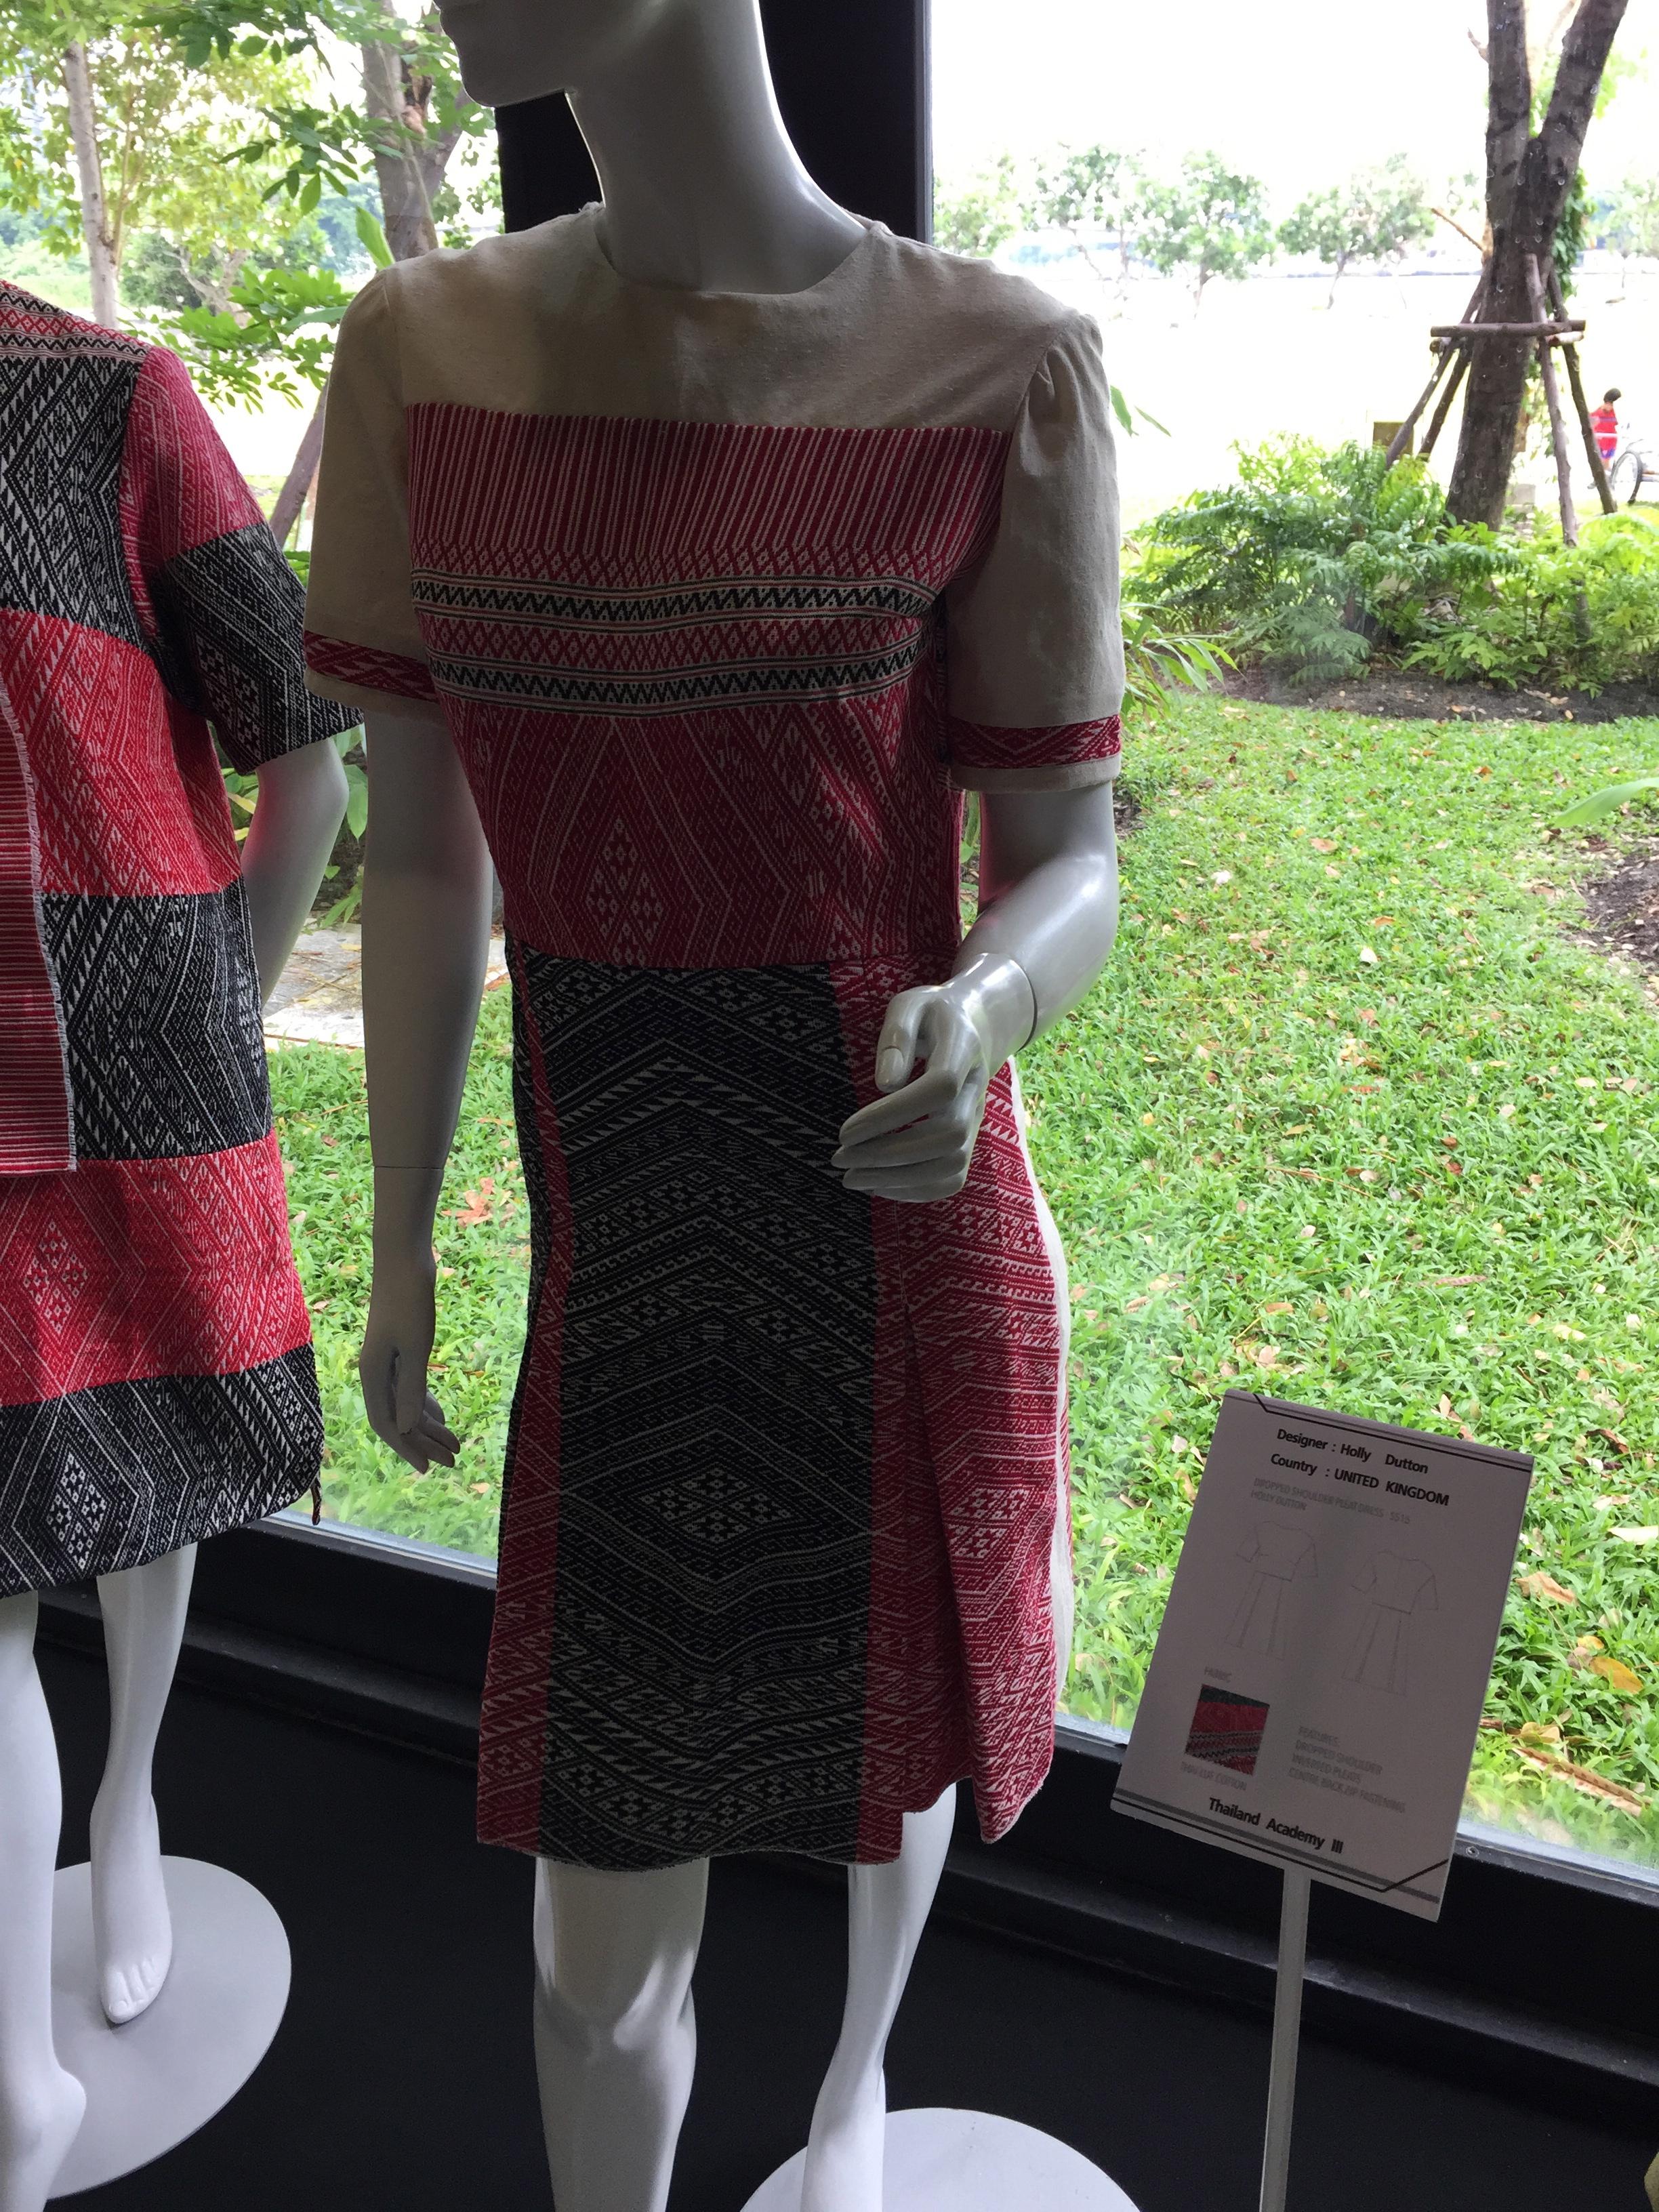 Holly Dutton's symmetrically madedress